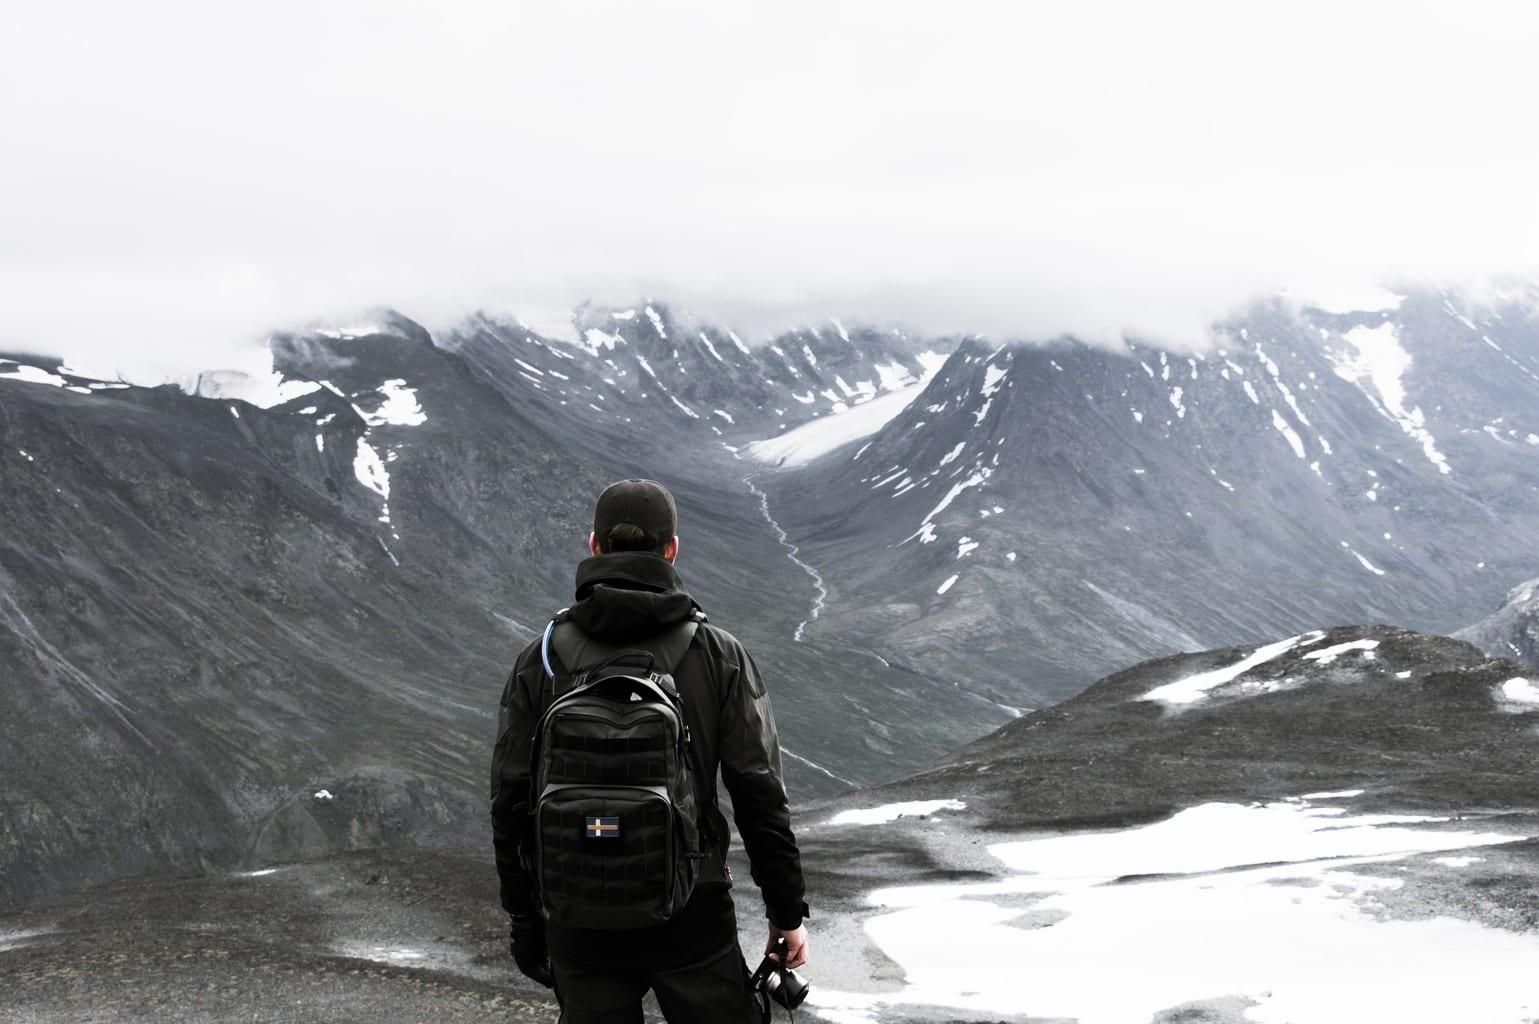 Fotógrafo en la nieve con mochila colgada a la espalda